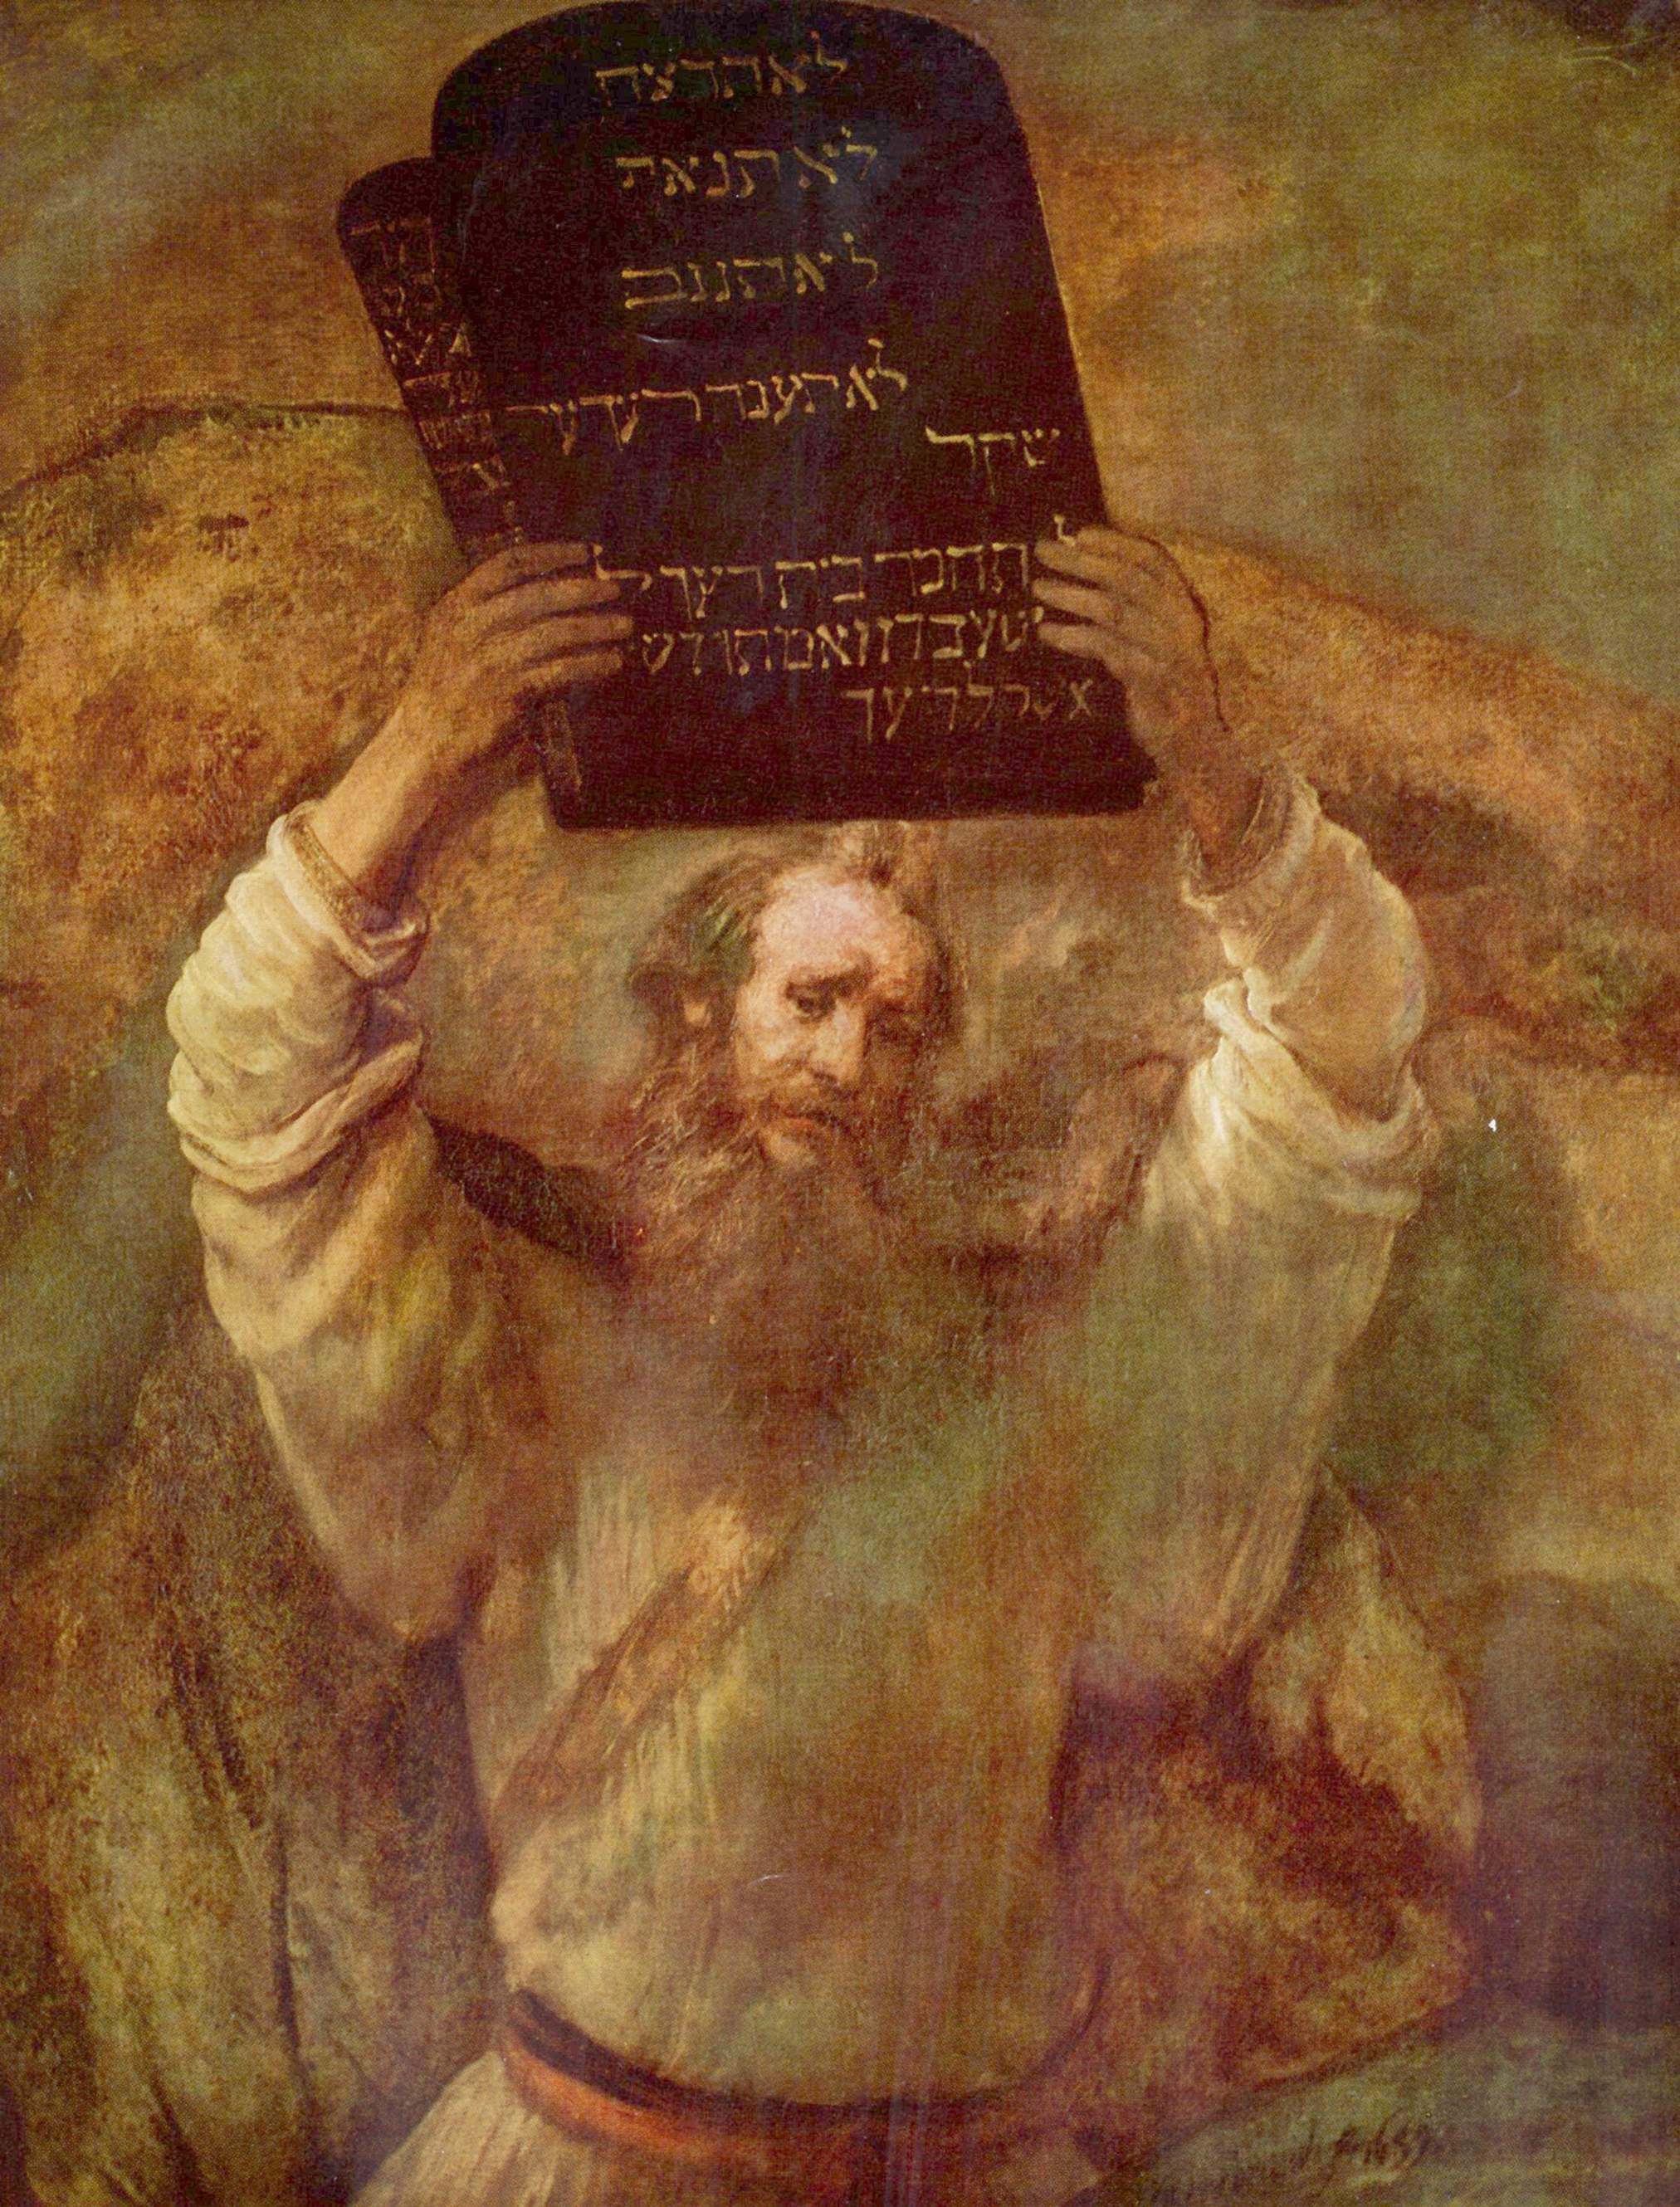 https://i2.wp.com/upload.wikimedia.org/wikipedia/commons/4/4a/Rembrandt_Harmensz._van_Rijn_079.jpg